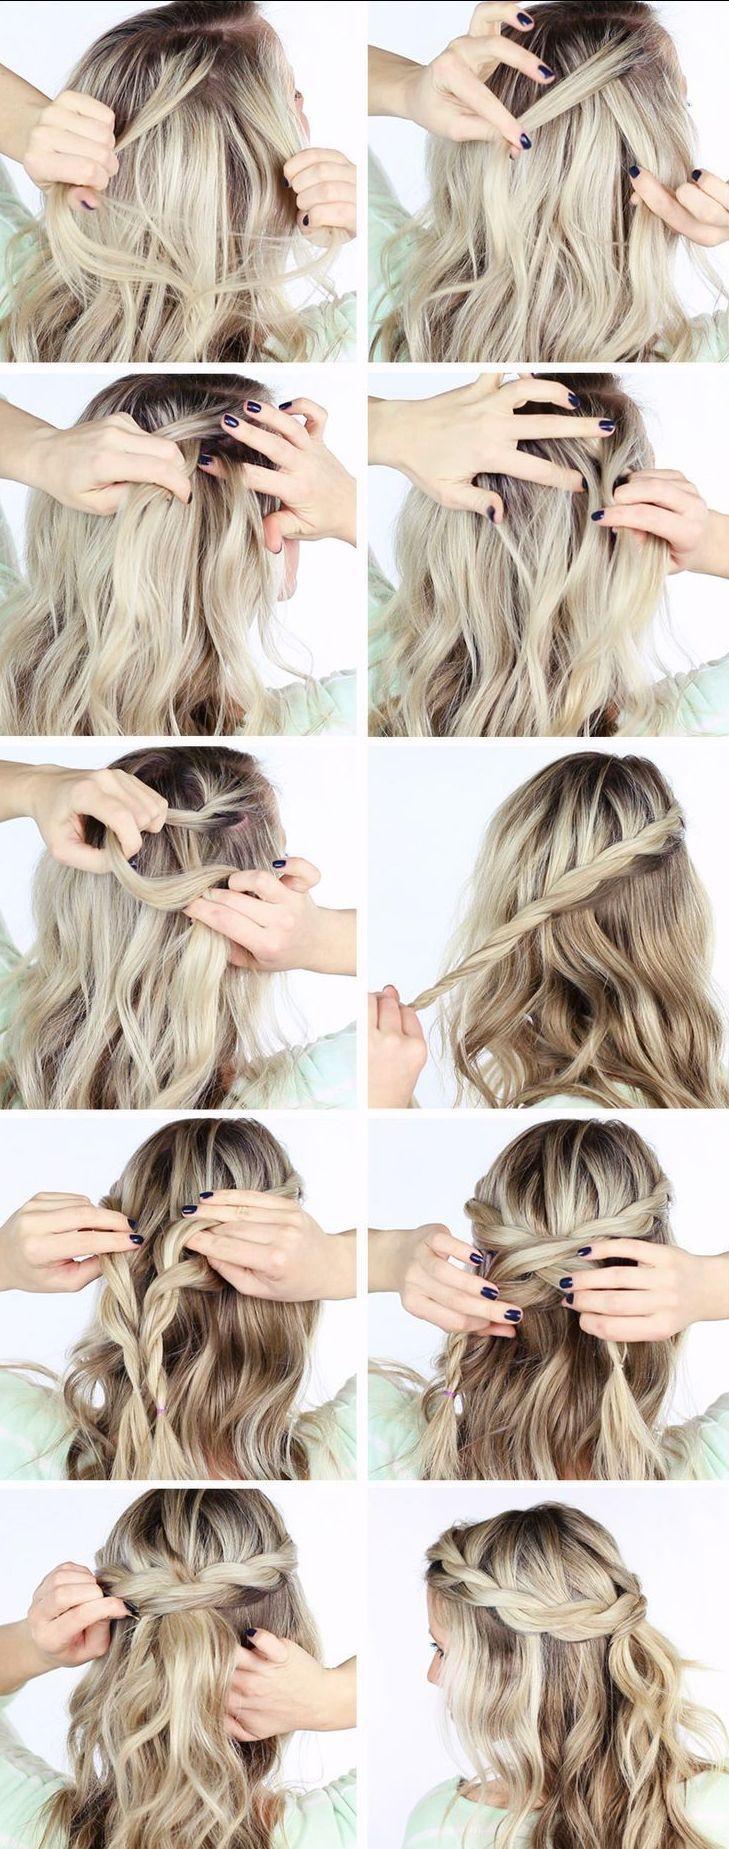 5 Tutos Coiffures A Adopter Cet Ete Long Hair Styles Medium Hair Styles Crown Hairstyles